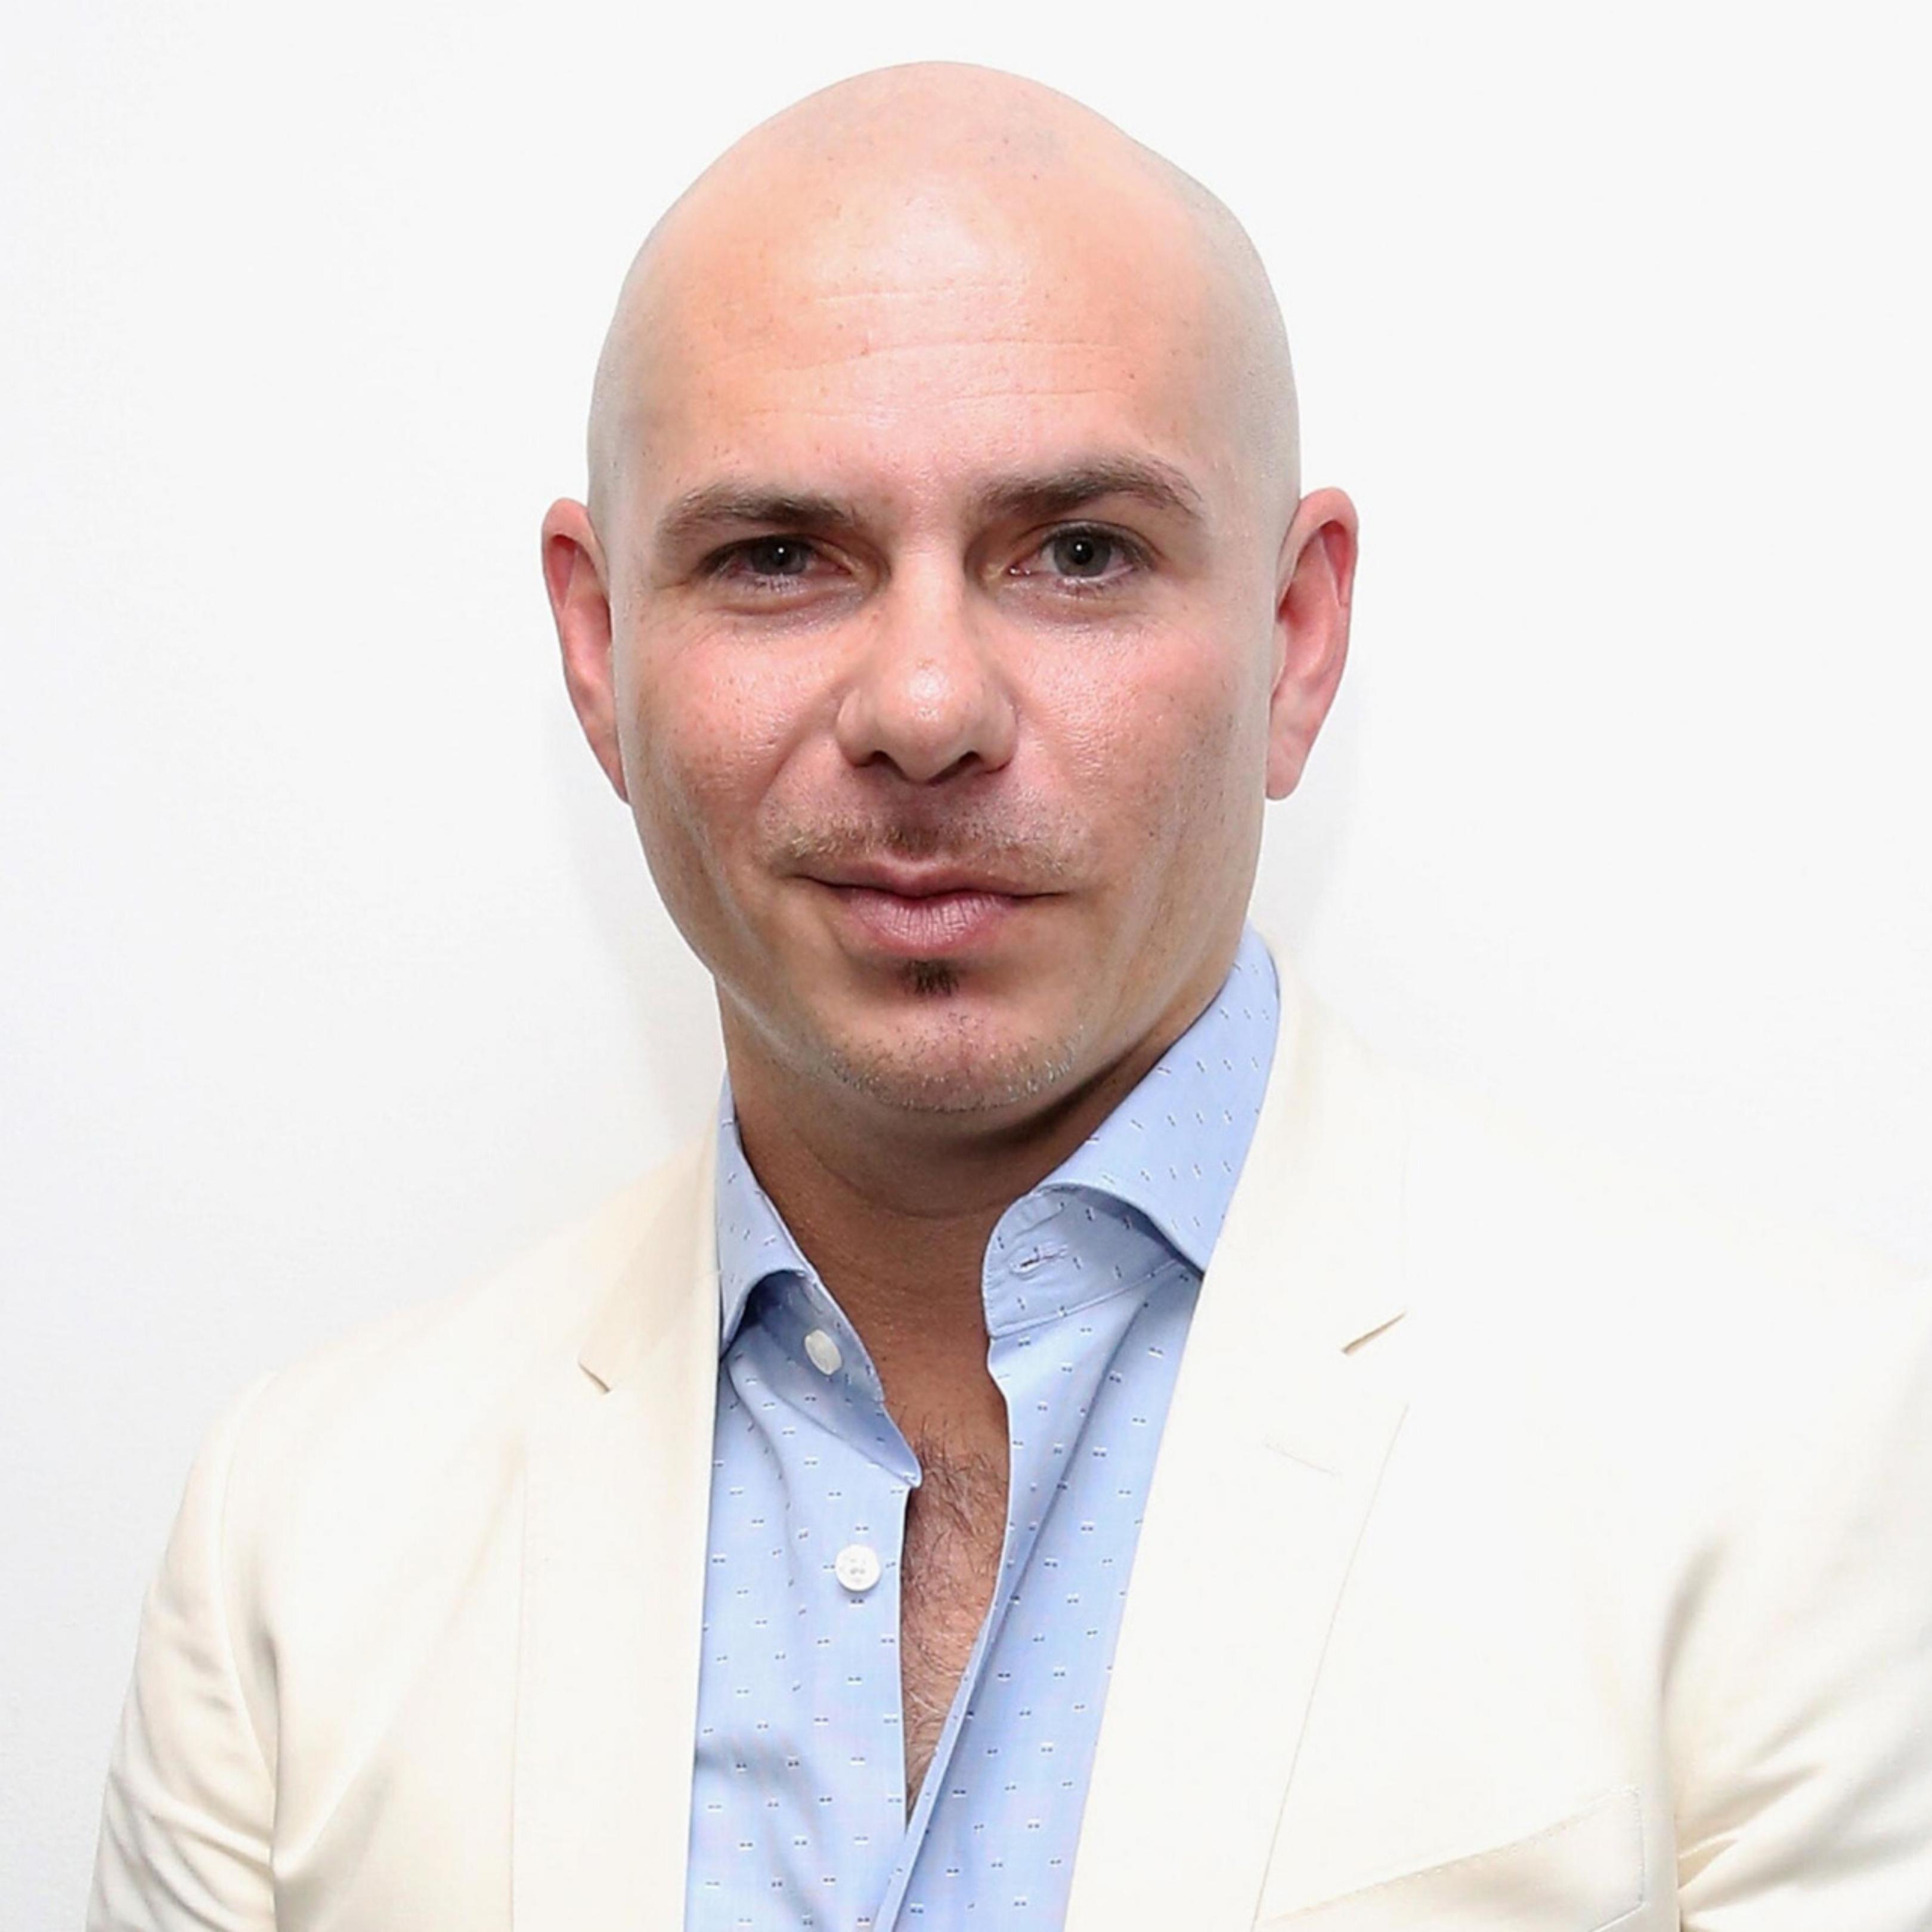 Armando Christian Pérez ``Pitbull``